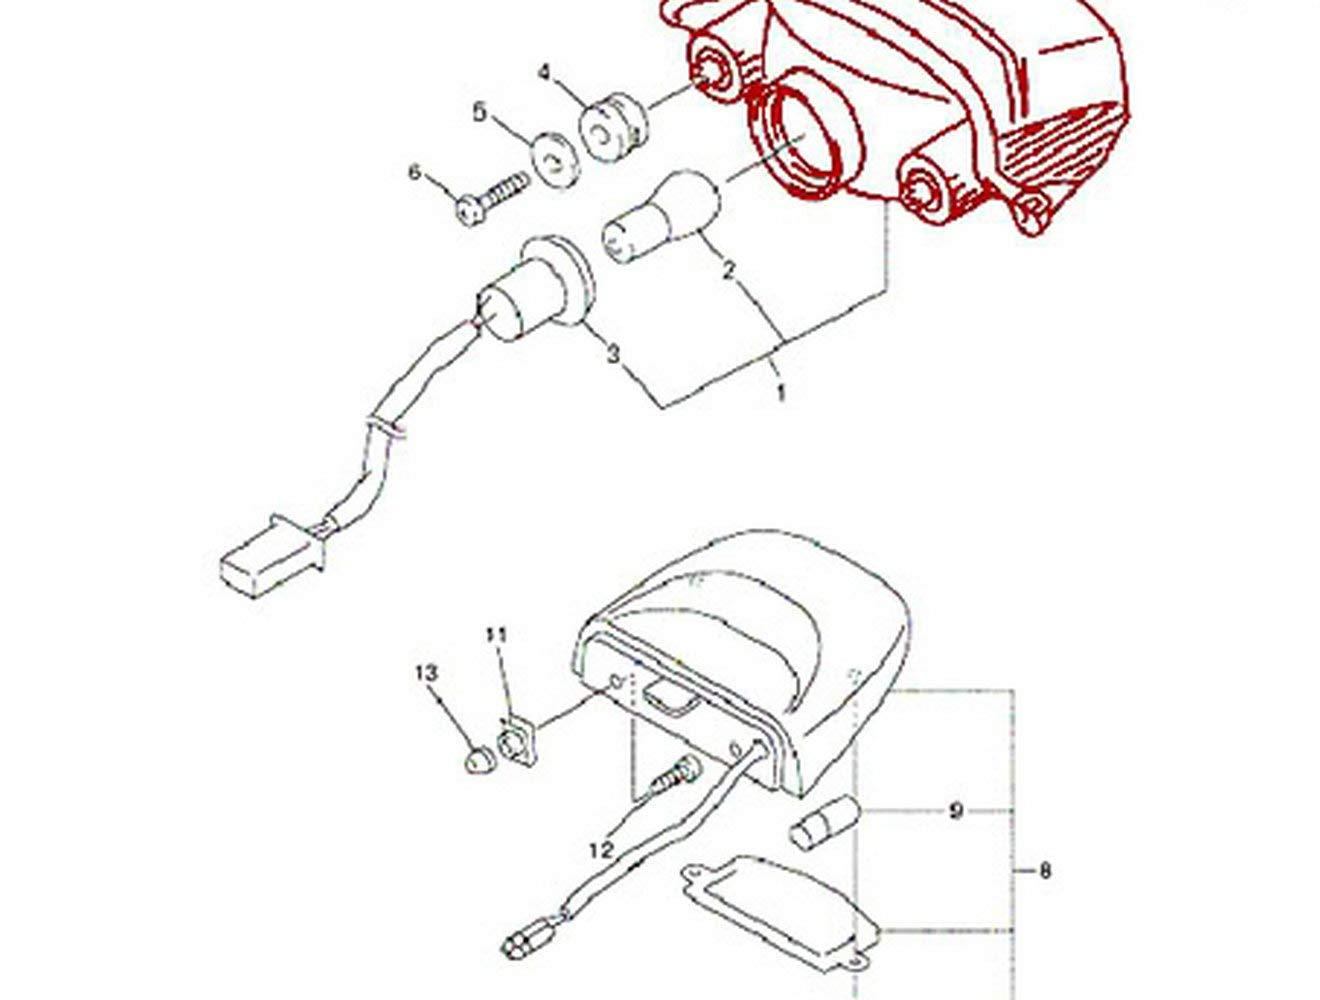 Mzs Fz6 Tail Light Led Integrated Turn Signal Blinker Fzx700 Yamaha Wiring Diagram For Fz 6 Fazer Fz600 2004 2005 2006 2007 2008 Smoke Automotive